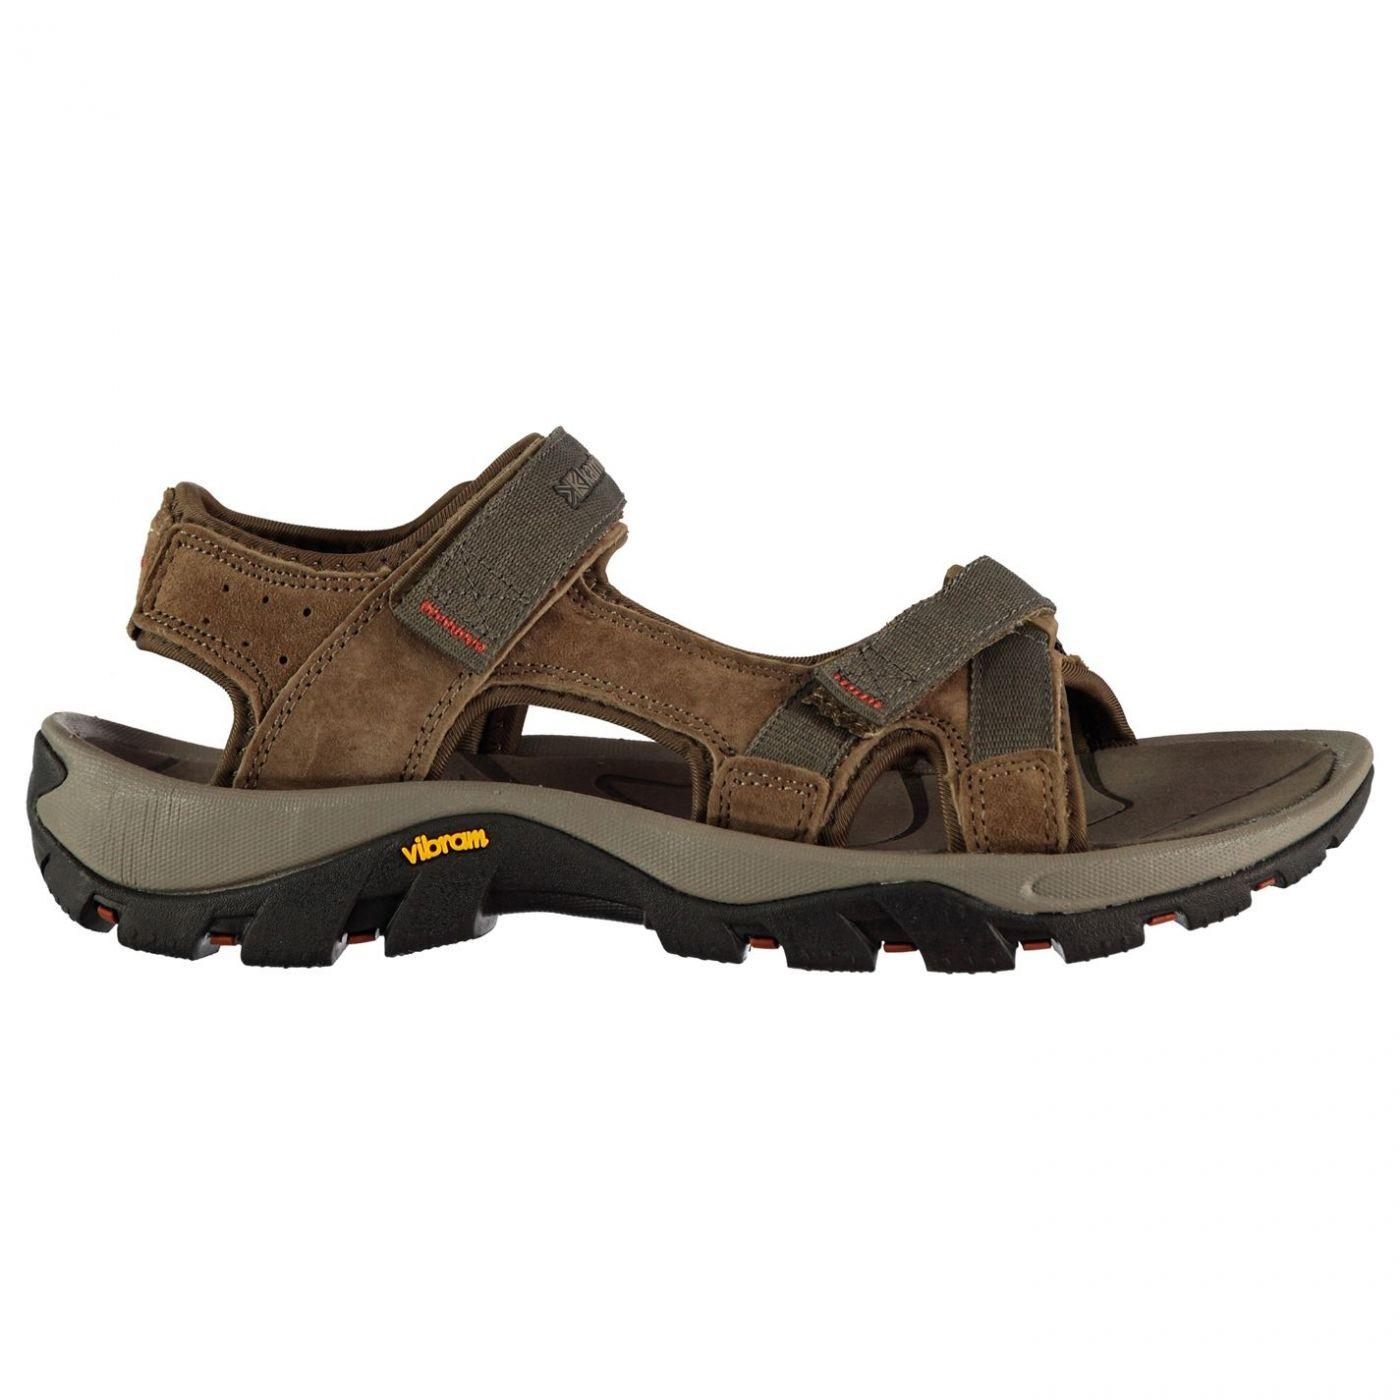 Karrimor Hawaii Mens Walking Sandals